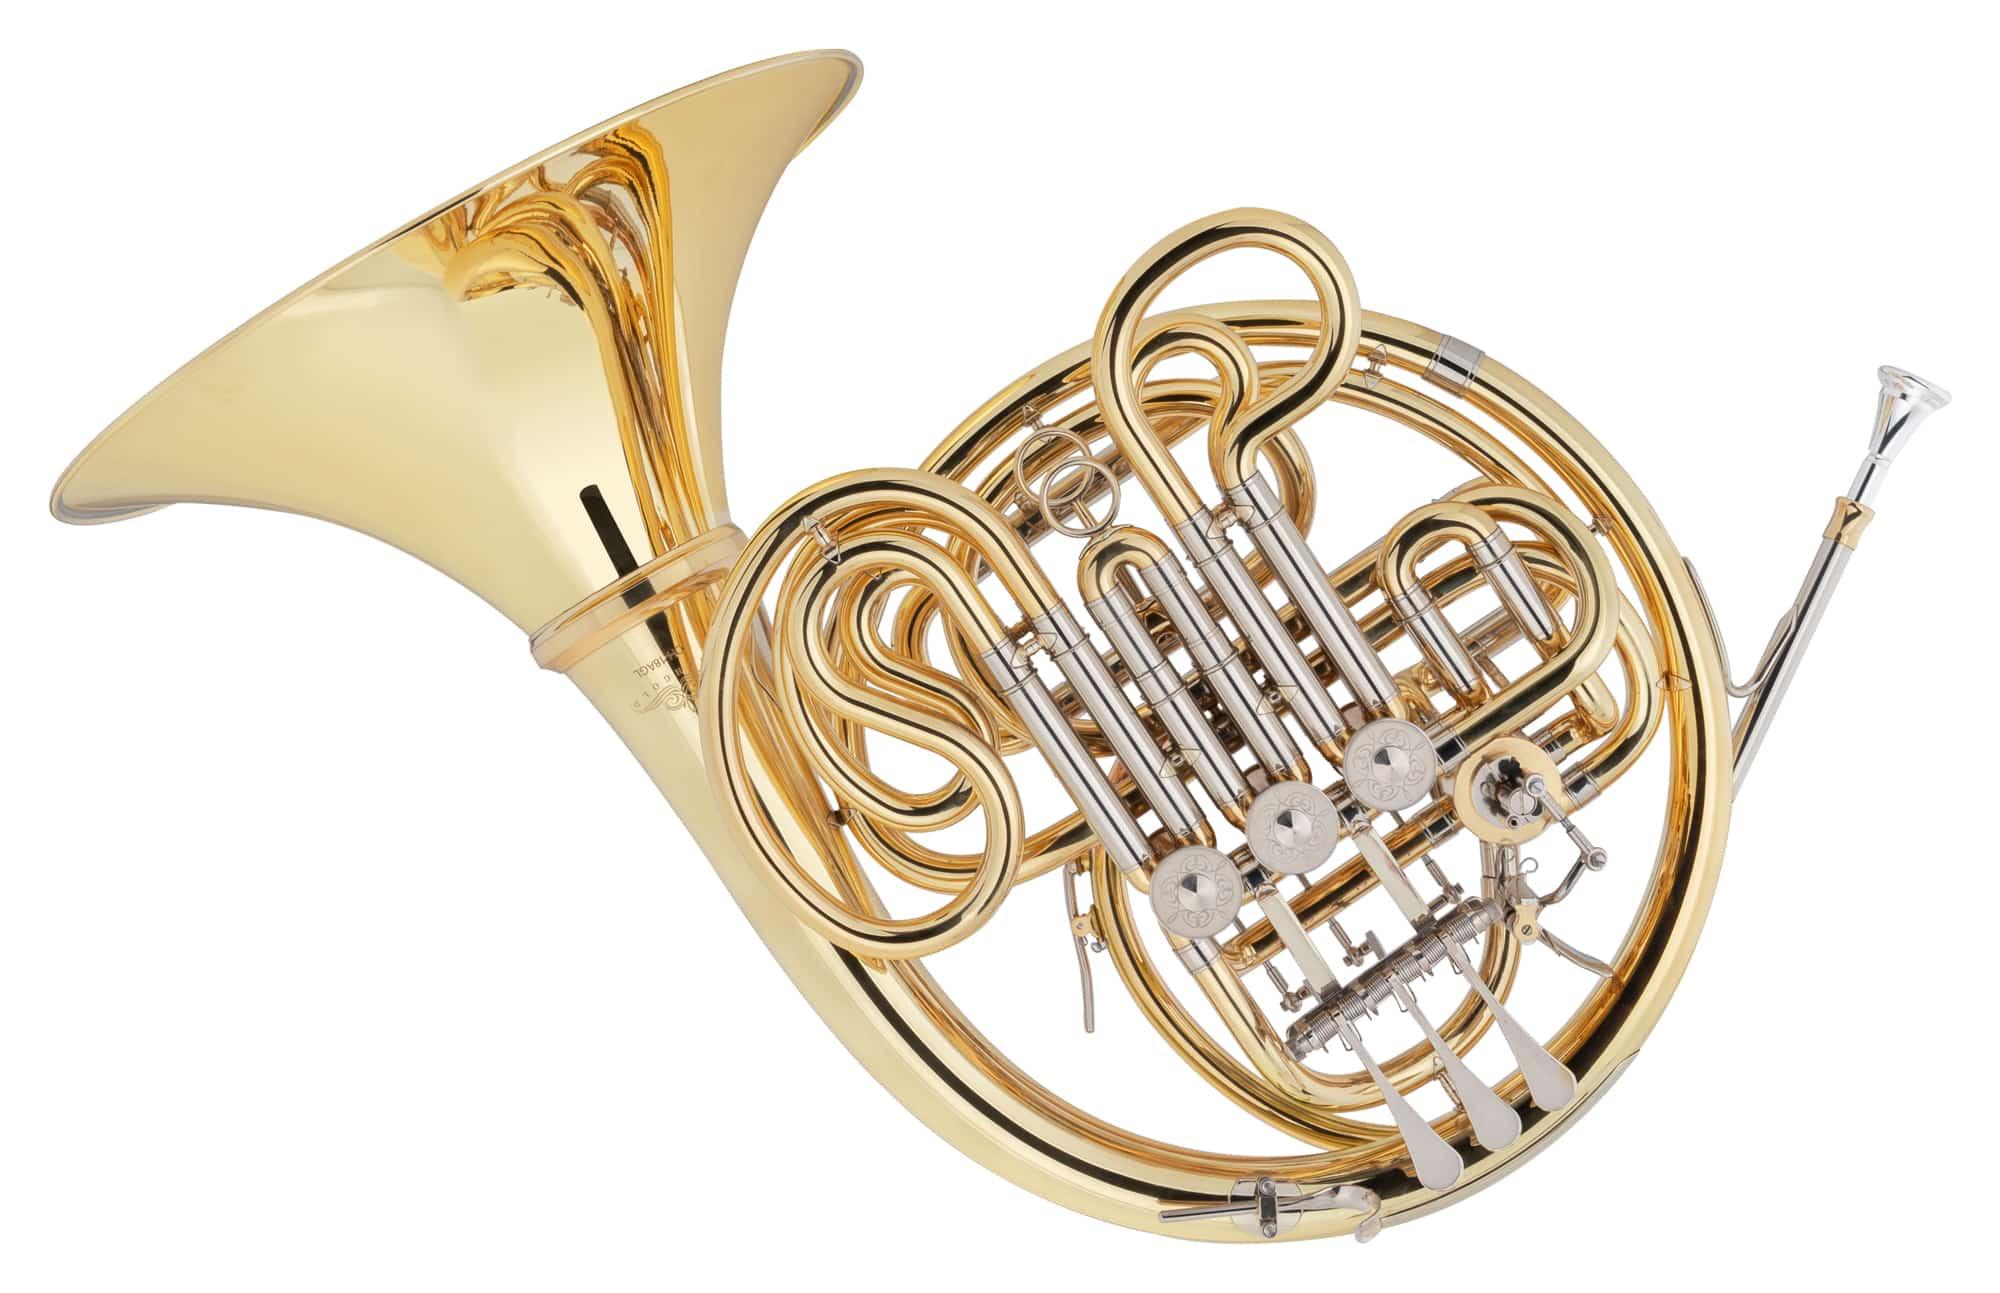 Hoerner - Lechgold DH 18AGL Doppelhorn - Onlineshop Musikhaus Kirstein